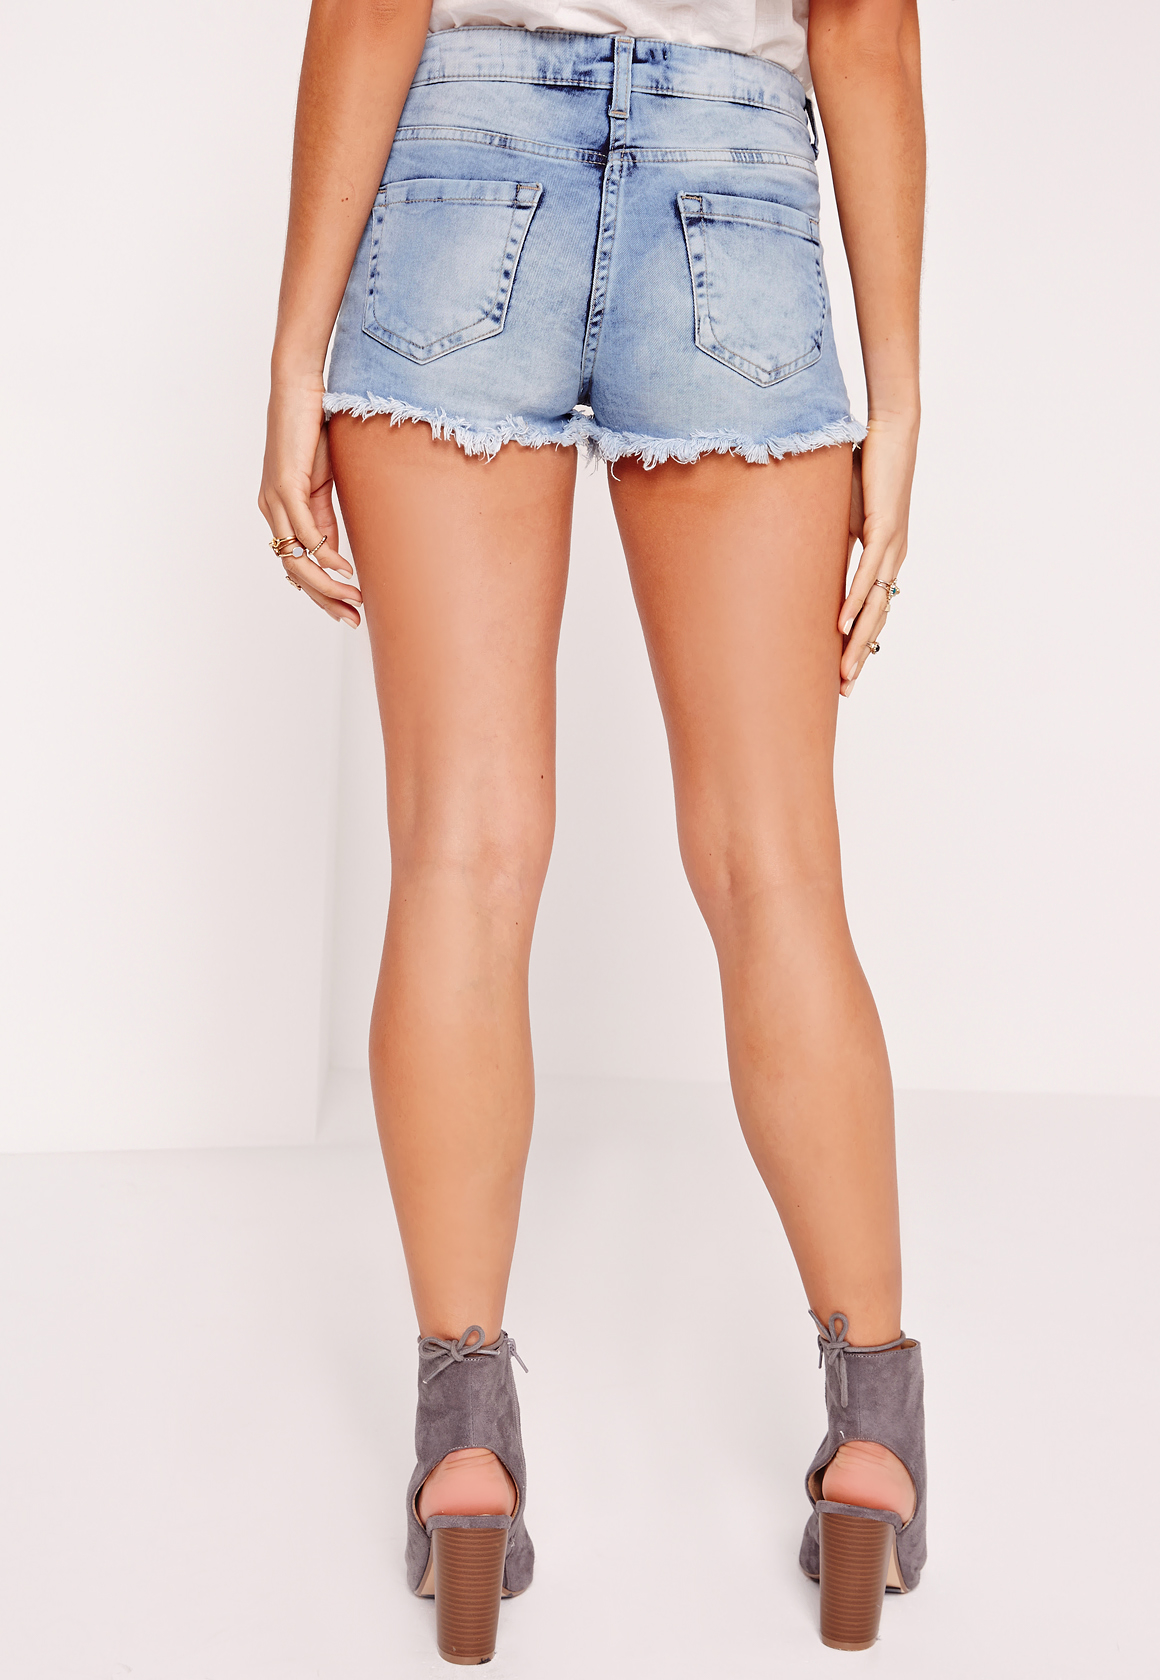 Missguided Hustler Mid Rise Embroidered Denim Shorts Blue